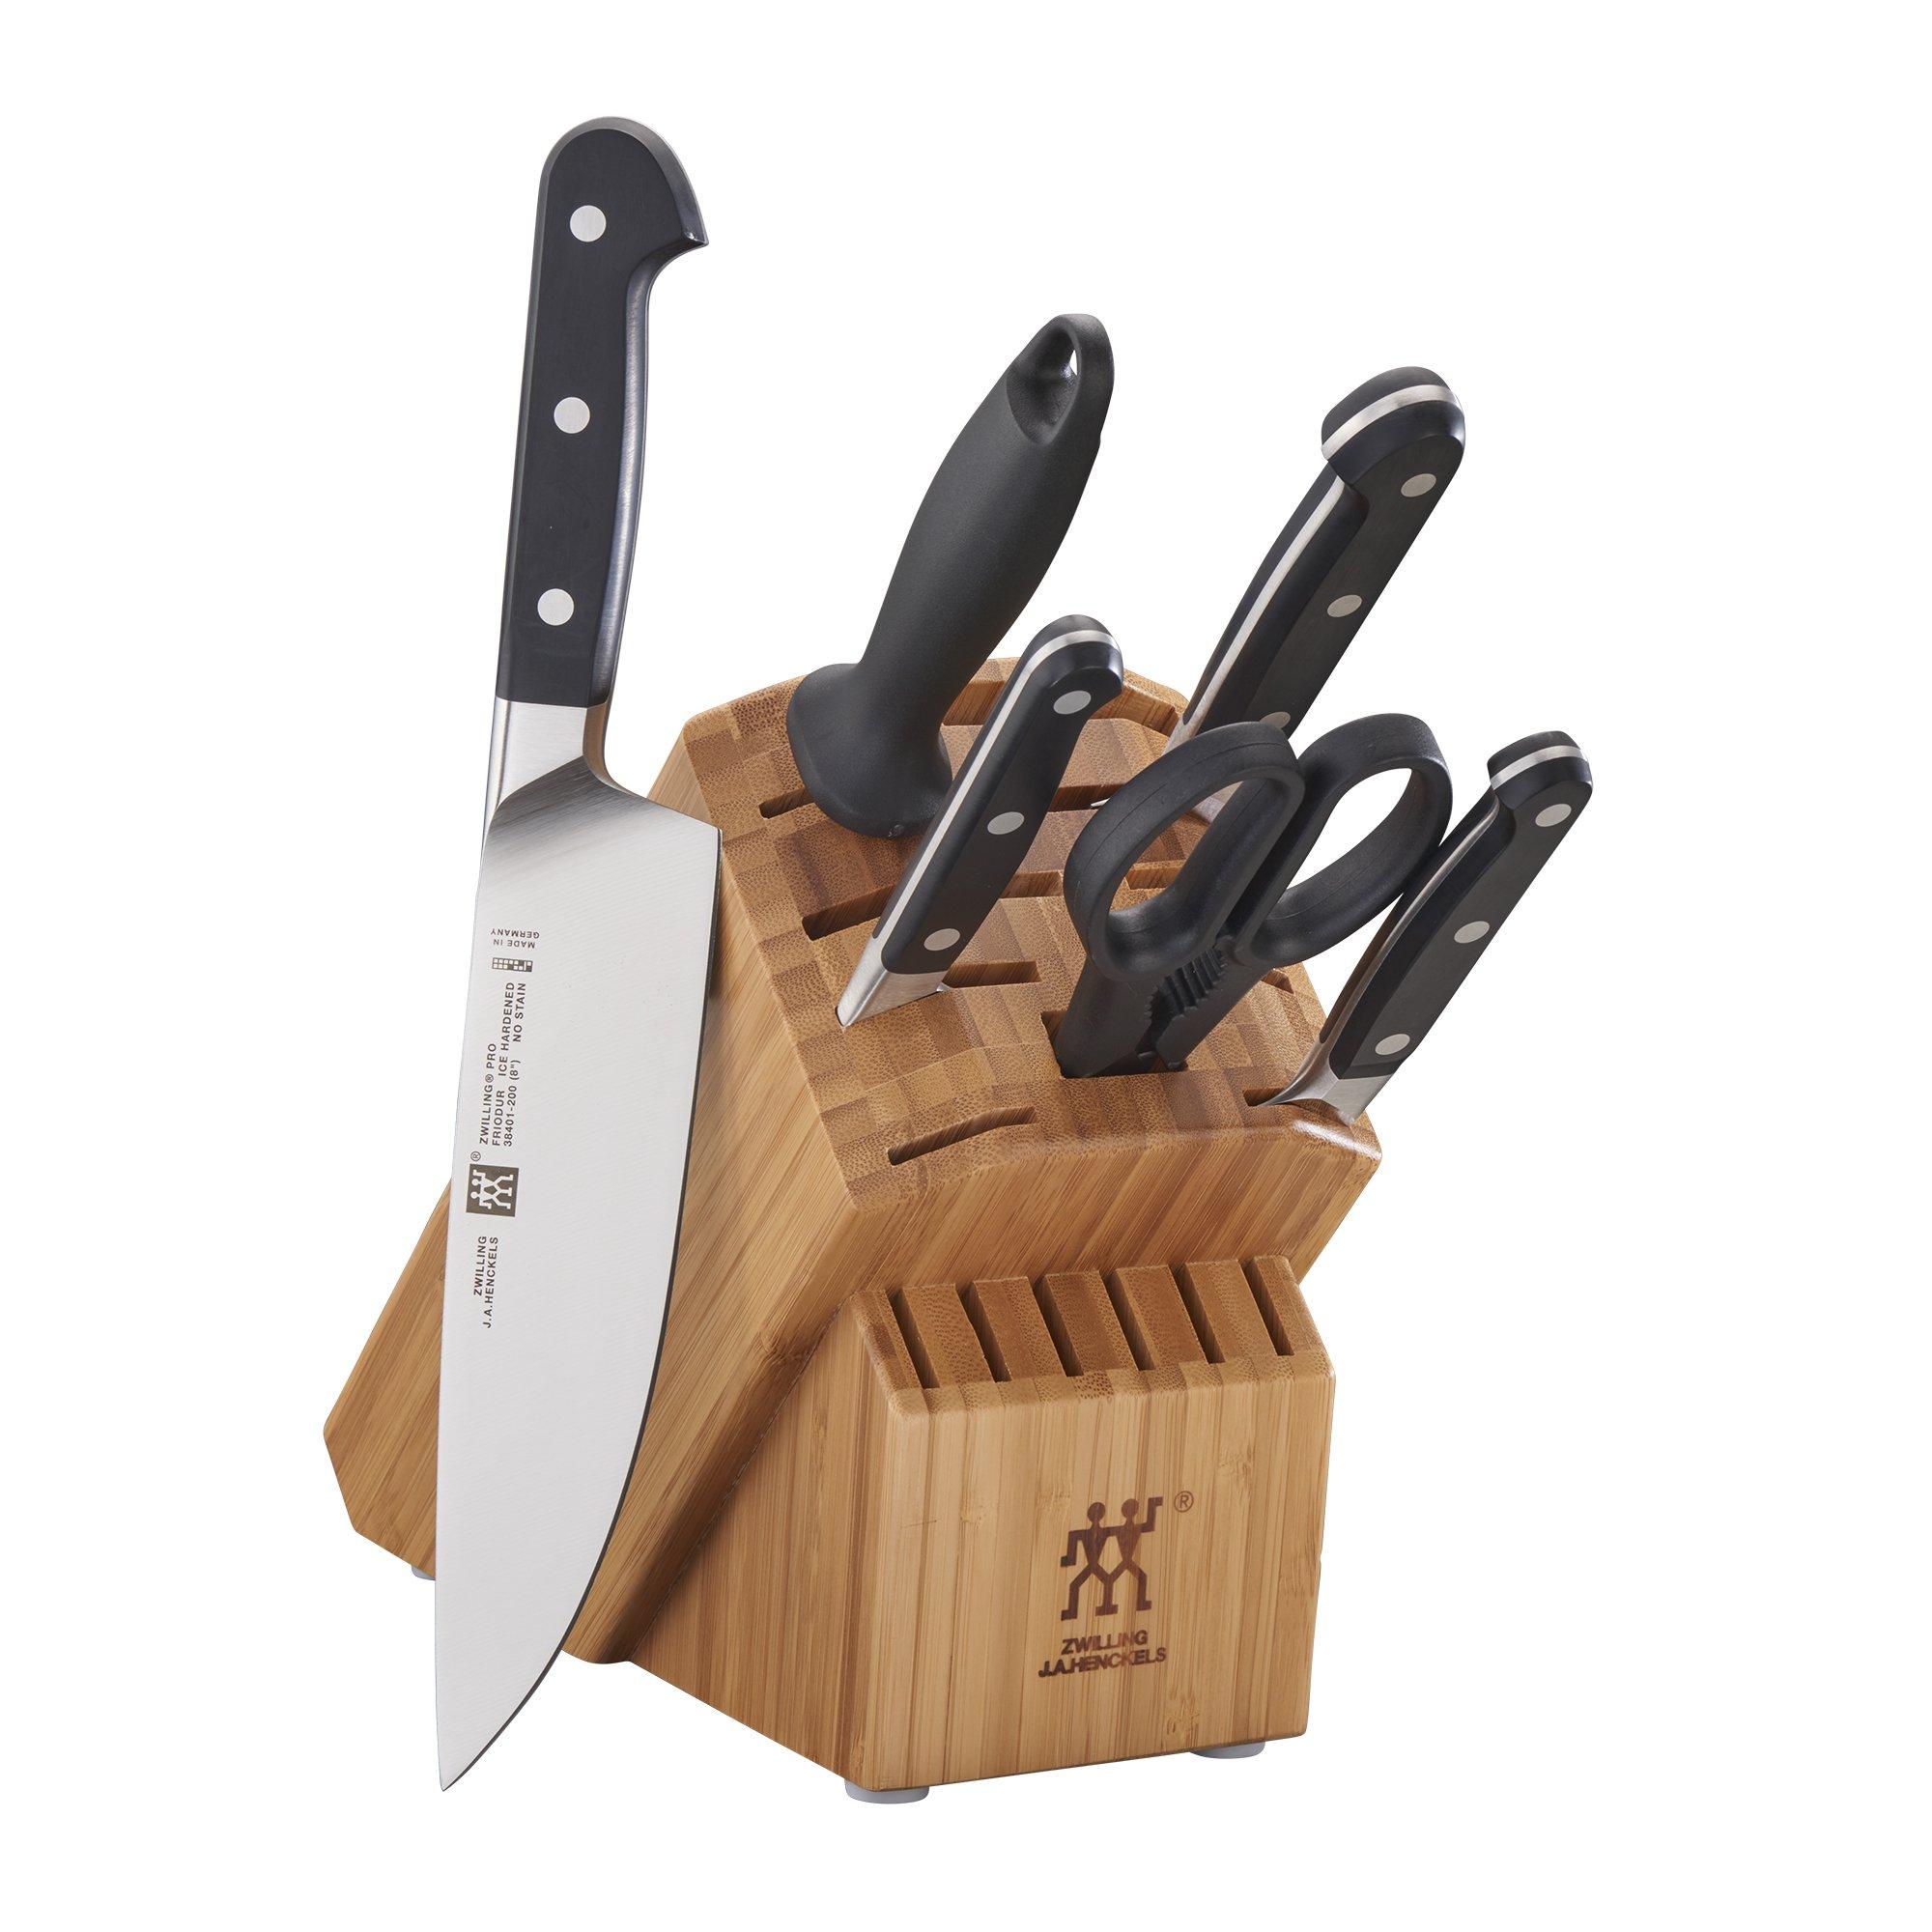 ZWILLING Pro 7-pc Knife Block Set - Bamboo